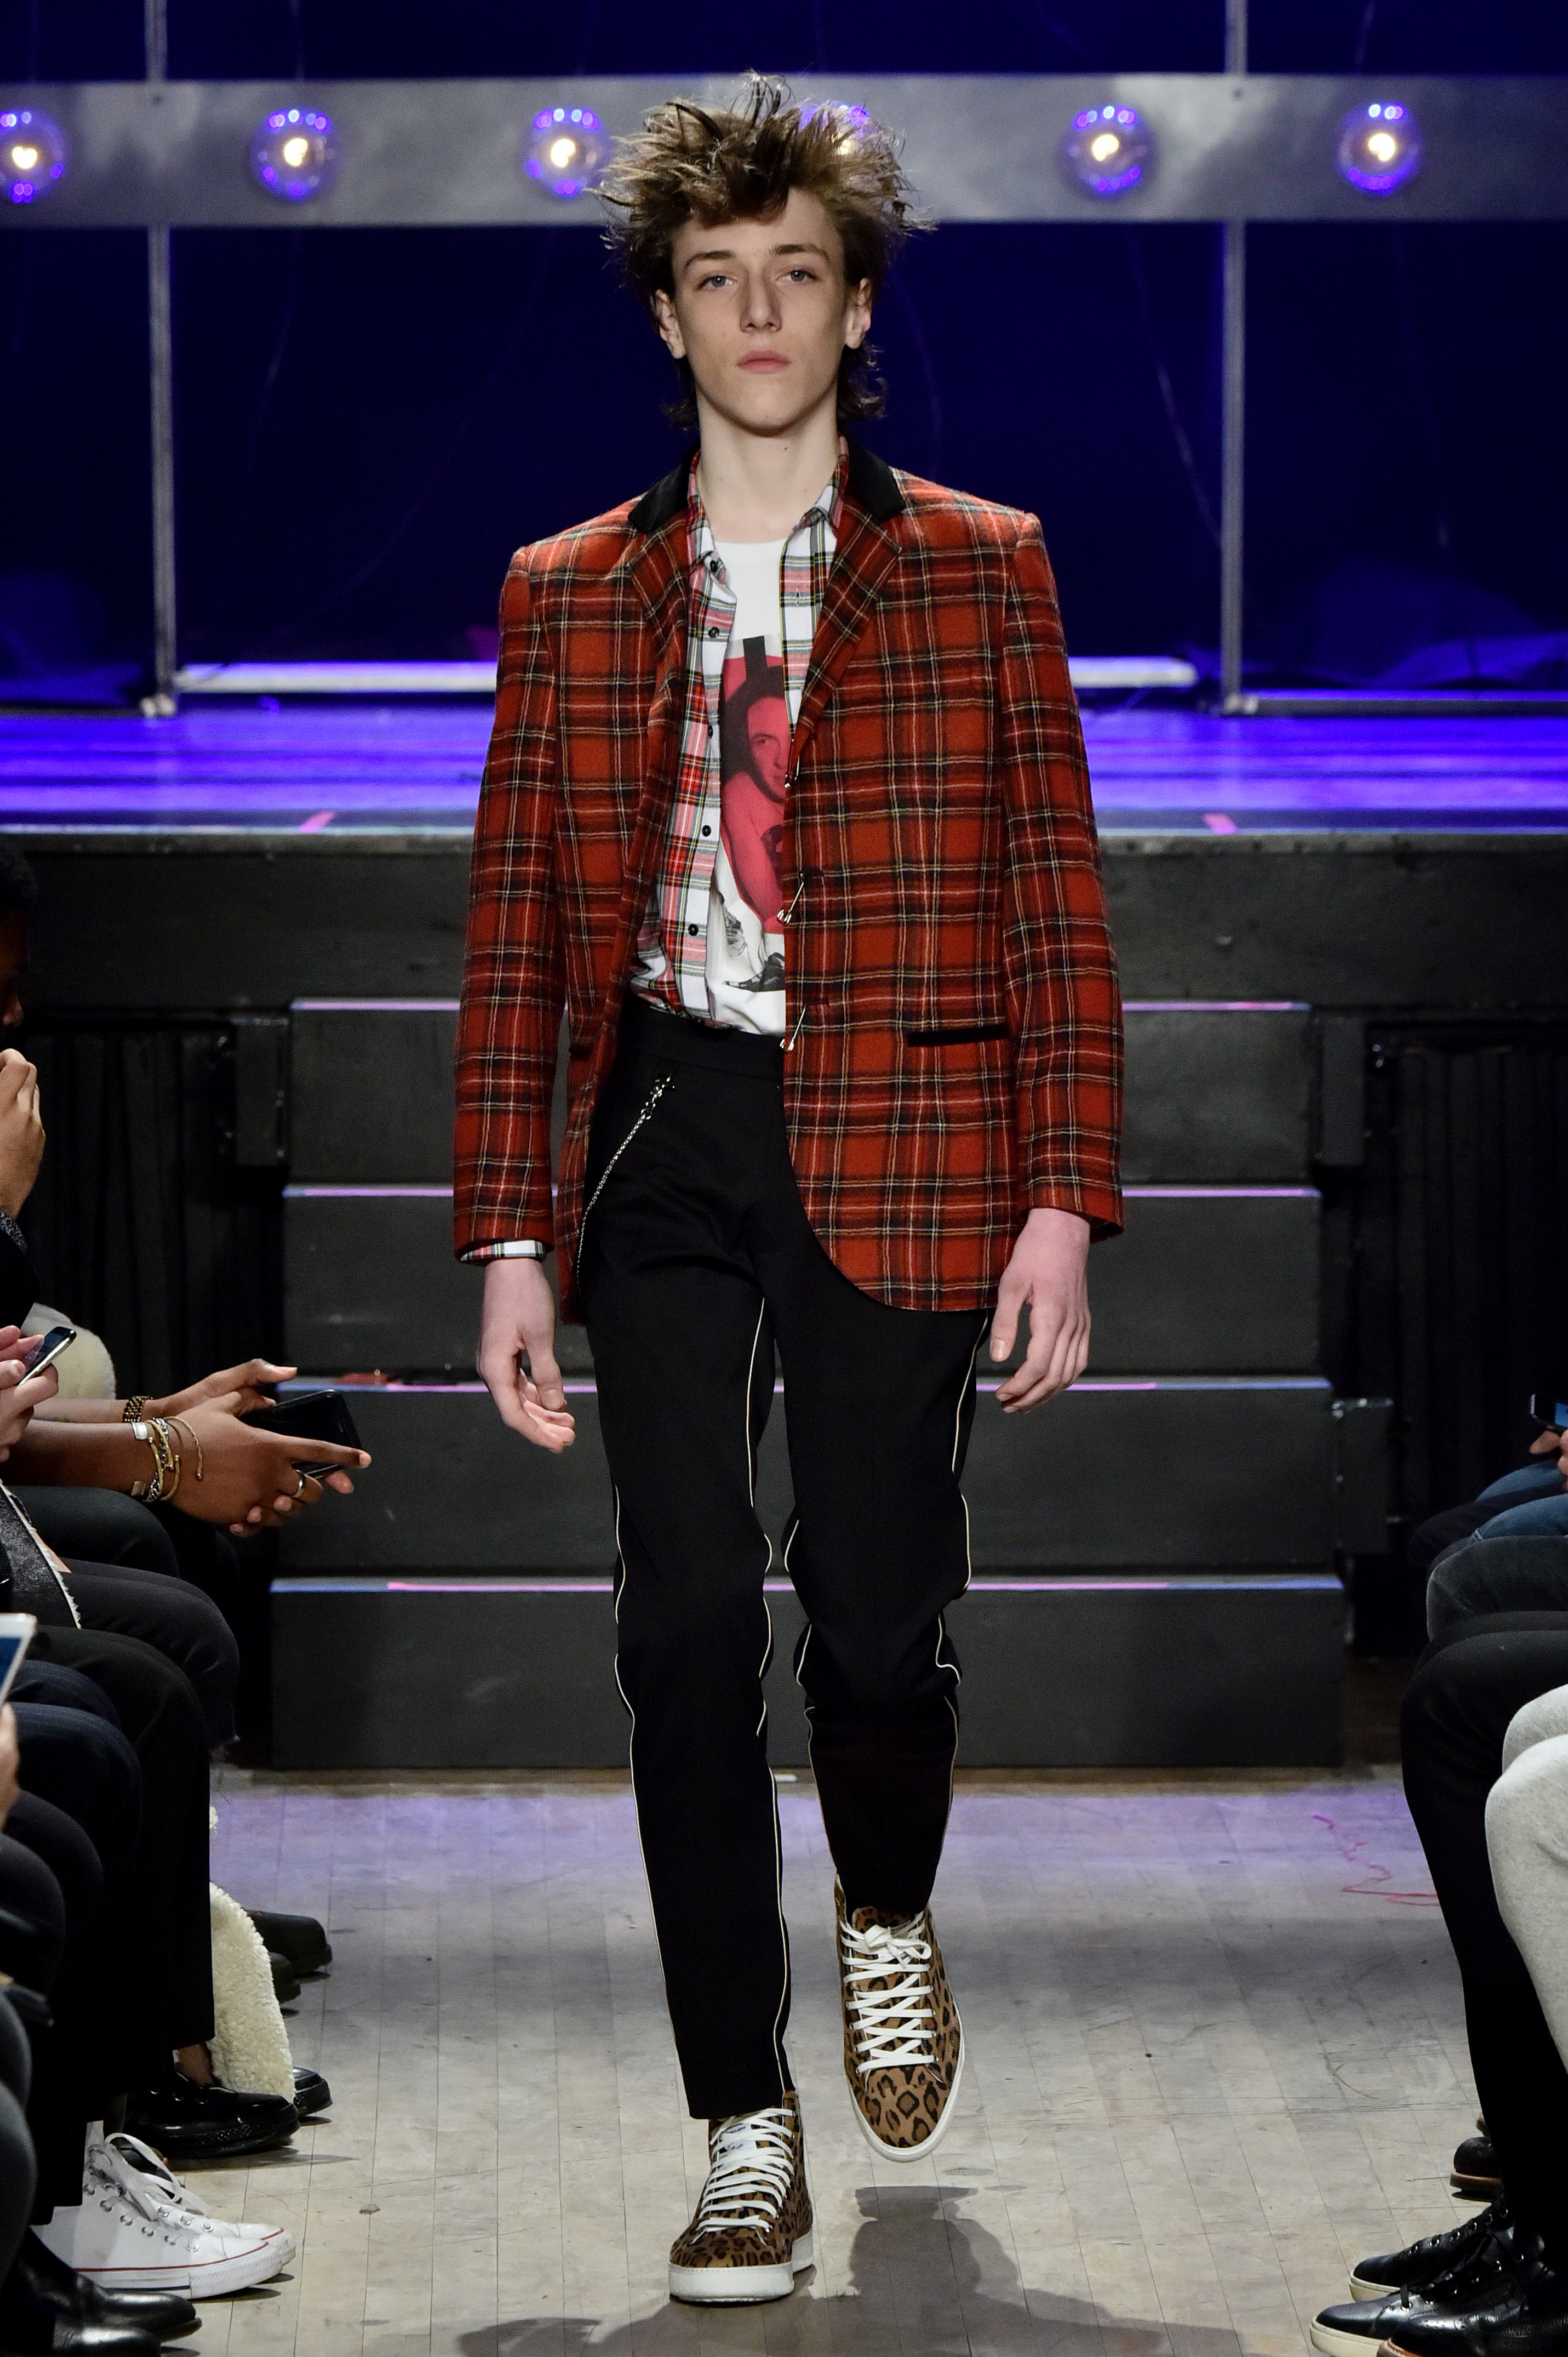 Model on the catwalkOvadia & Sons show, Runway, Fall Winter 2018, New York Fashion Week Men's, USA - 05 Feb 2018